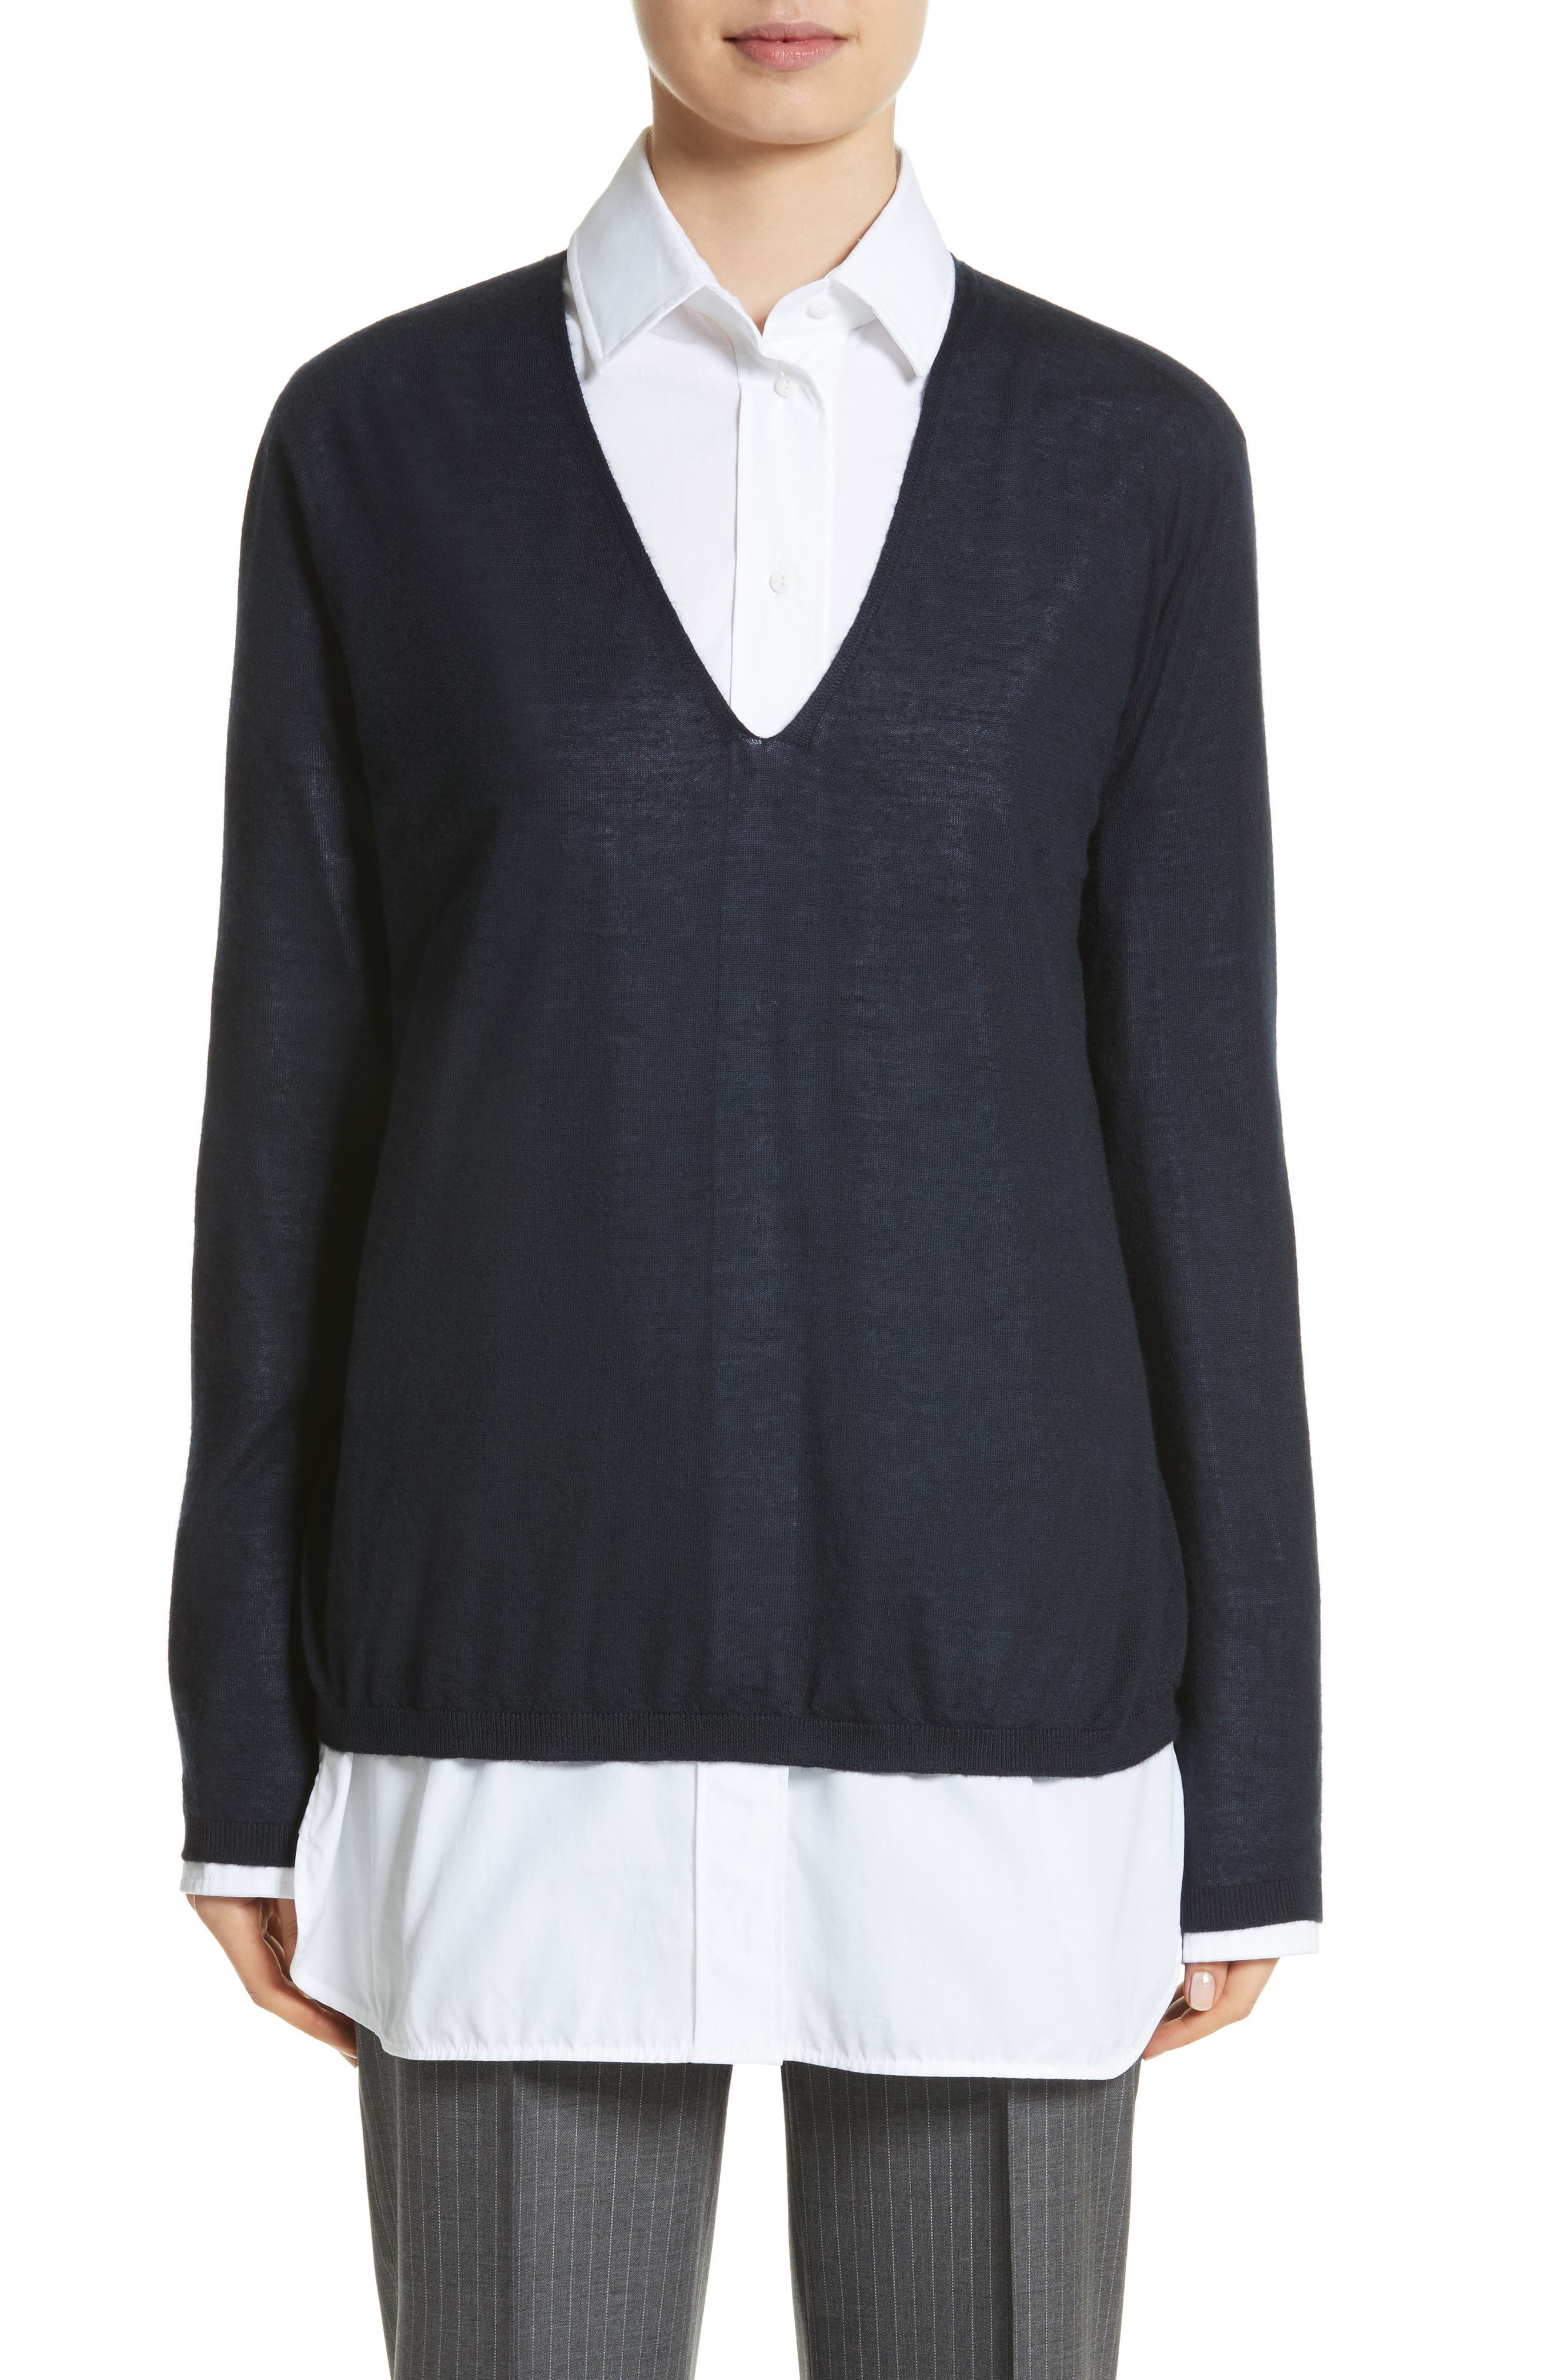 Vela Cashmere Sweater,                             Main thumbnail 1, color,                             411